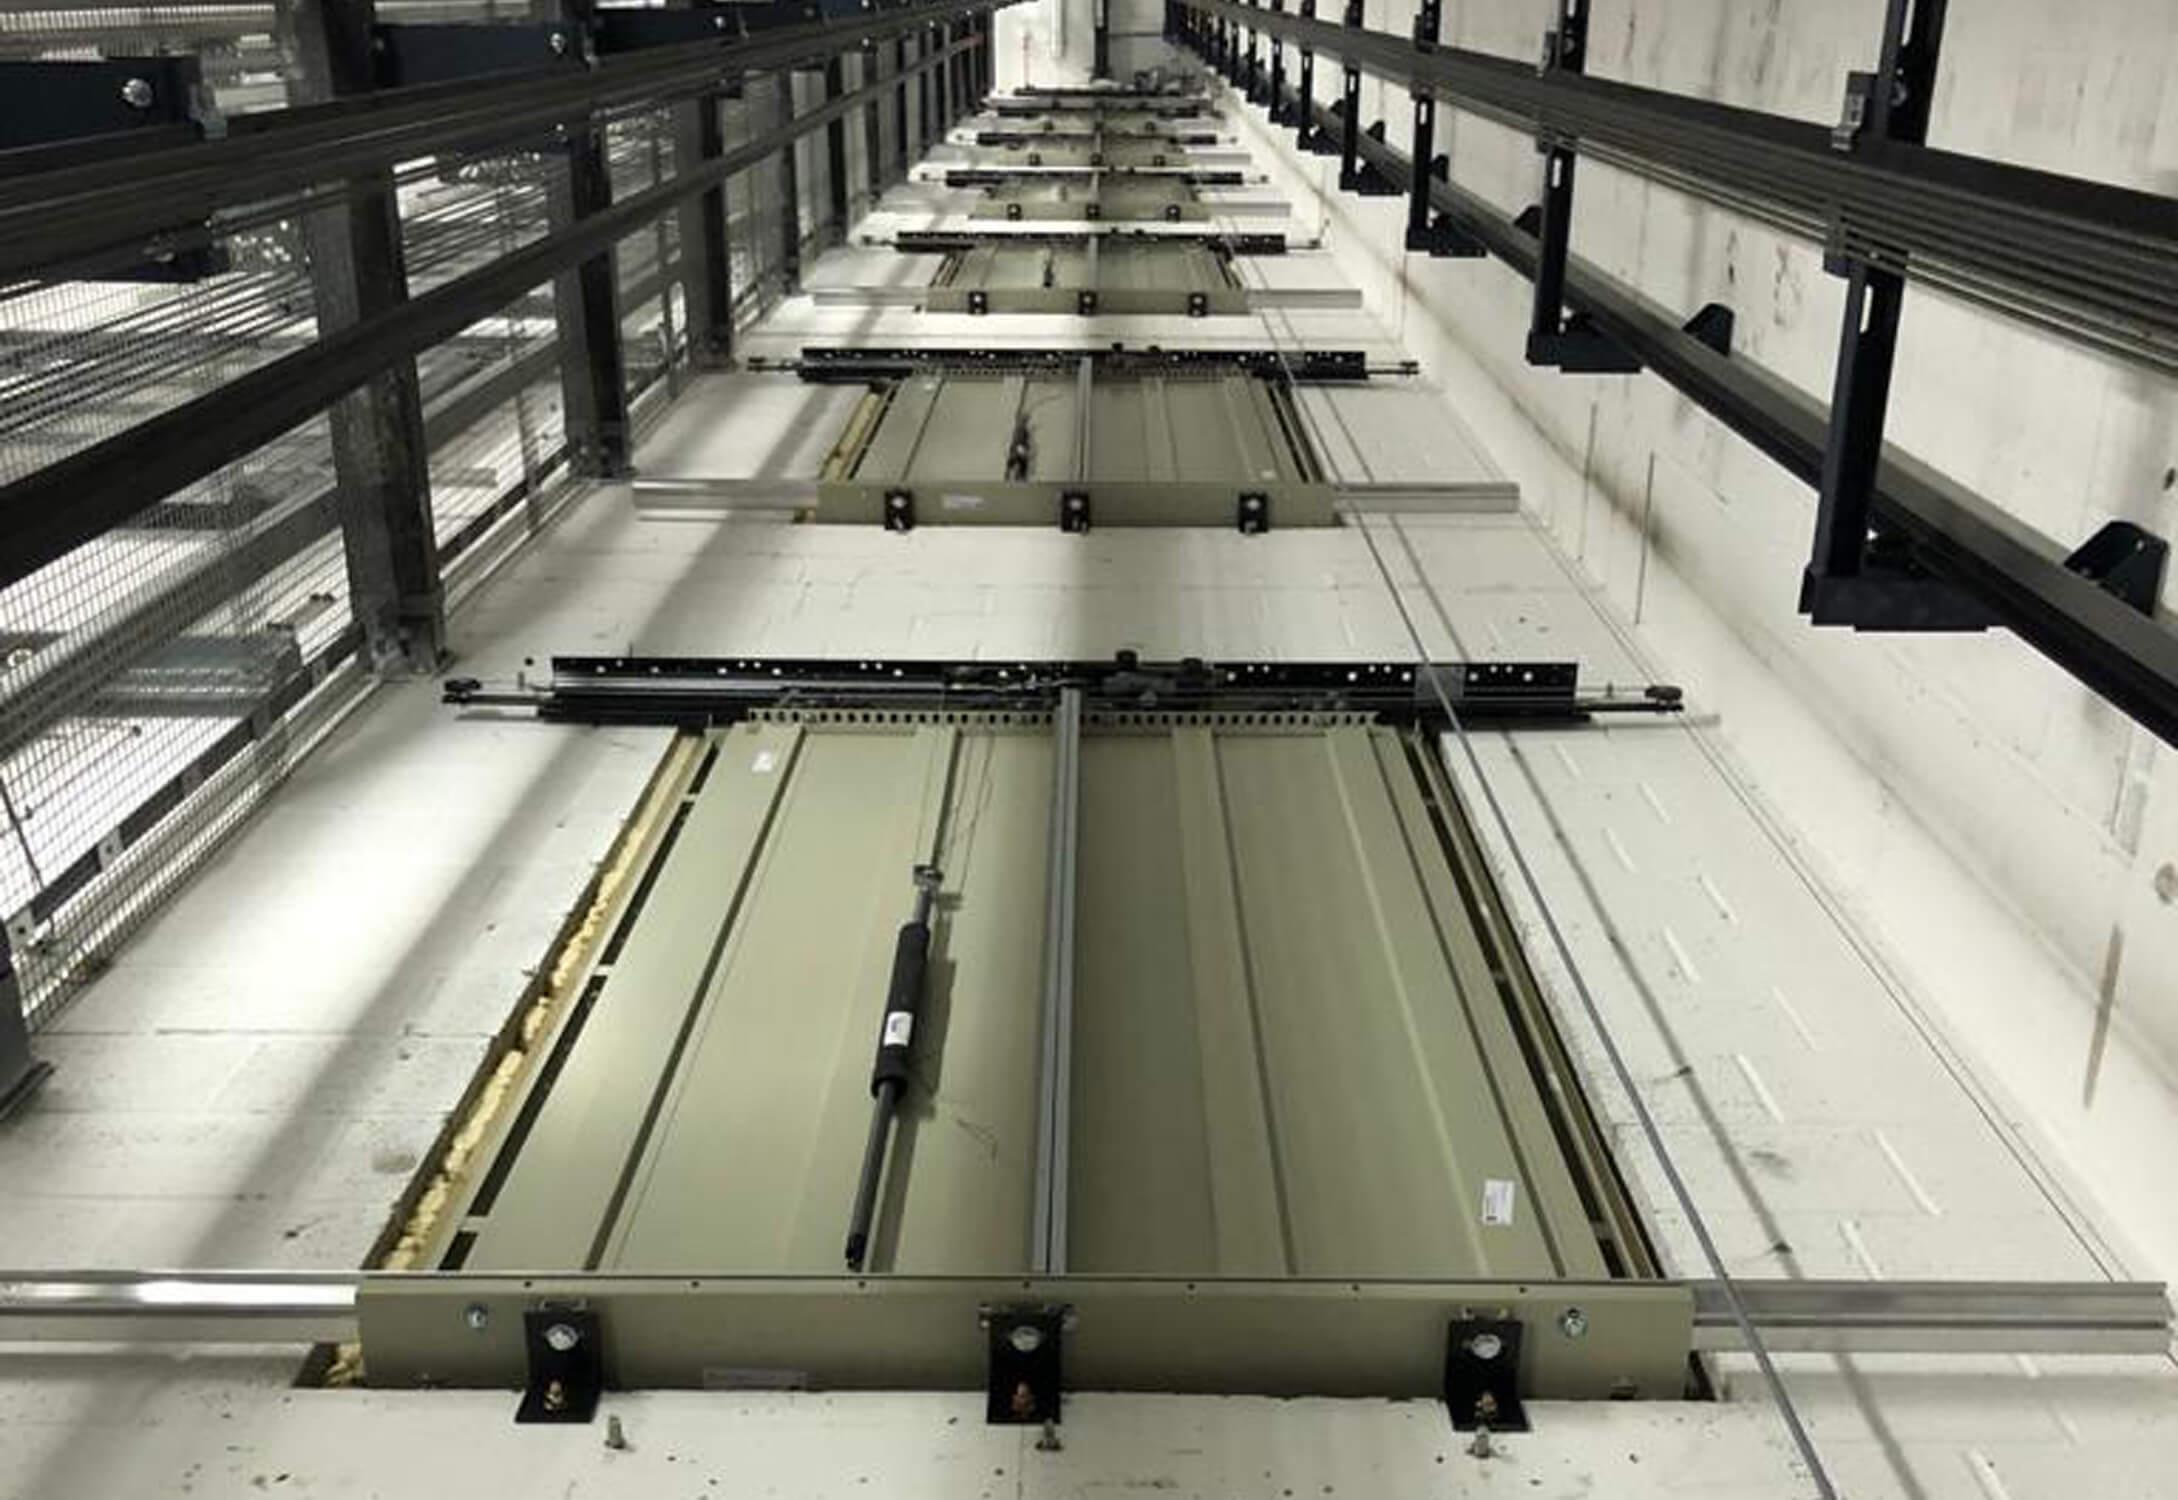 Lift shaft of a university passenger lift